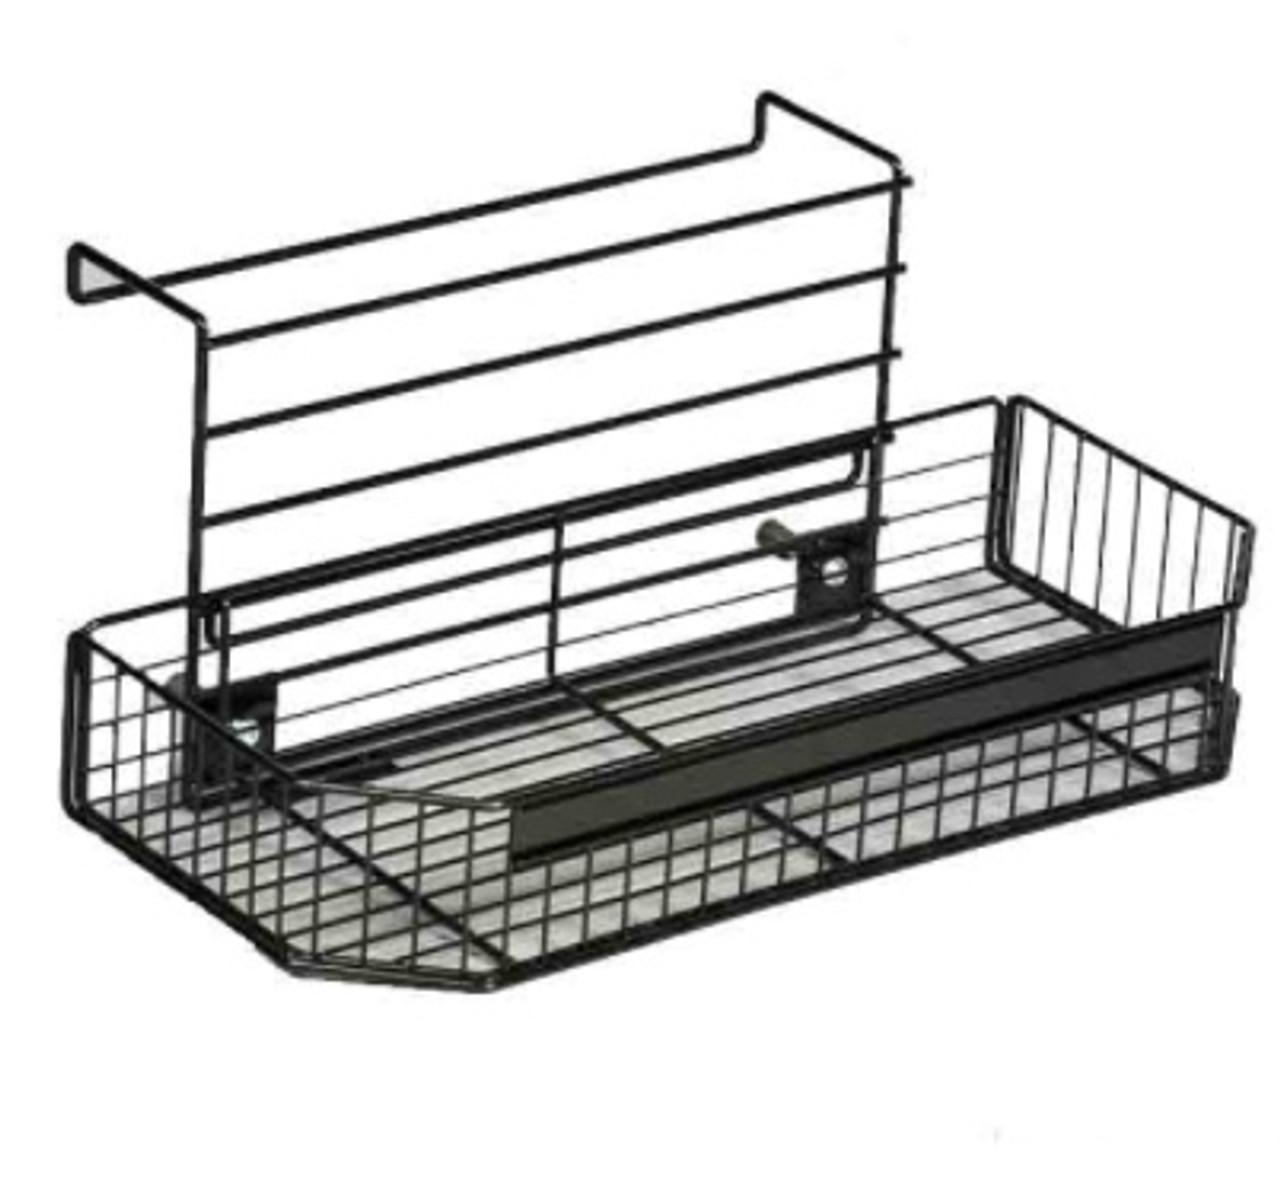 Cooler mount basket - empty